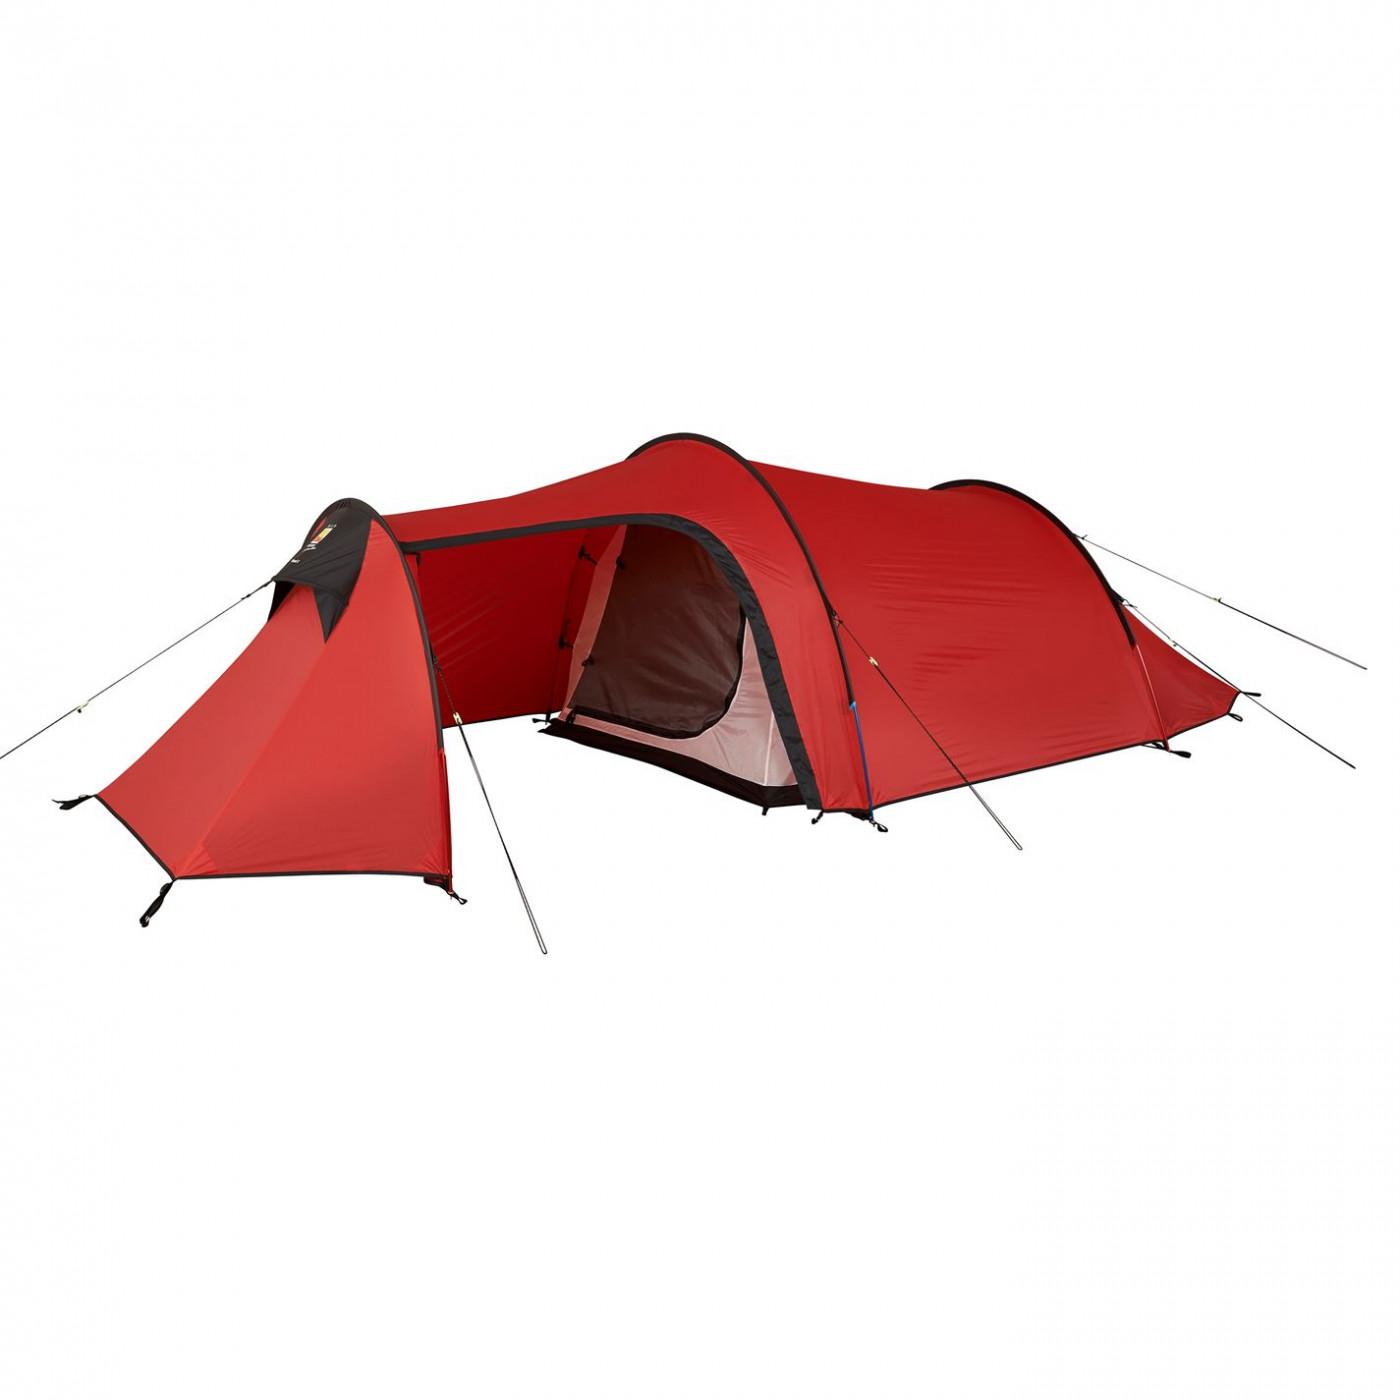 Wild Country by Terra Nova Blizzard 3 Tent